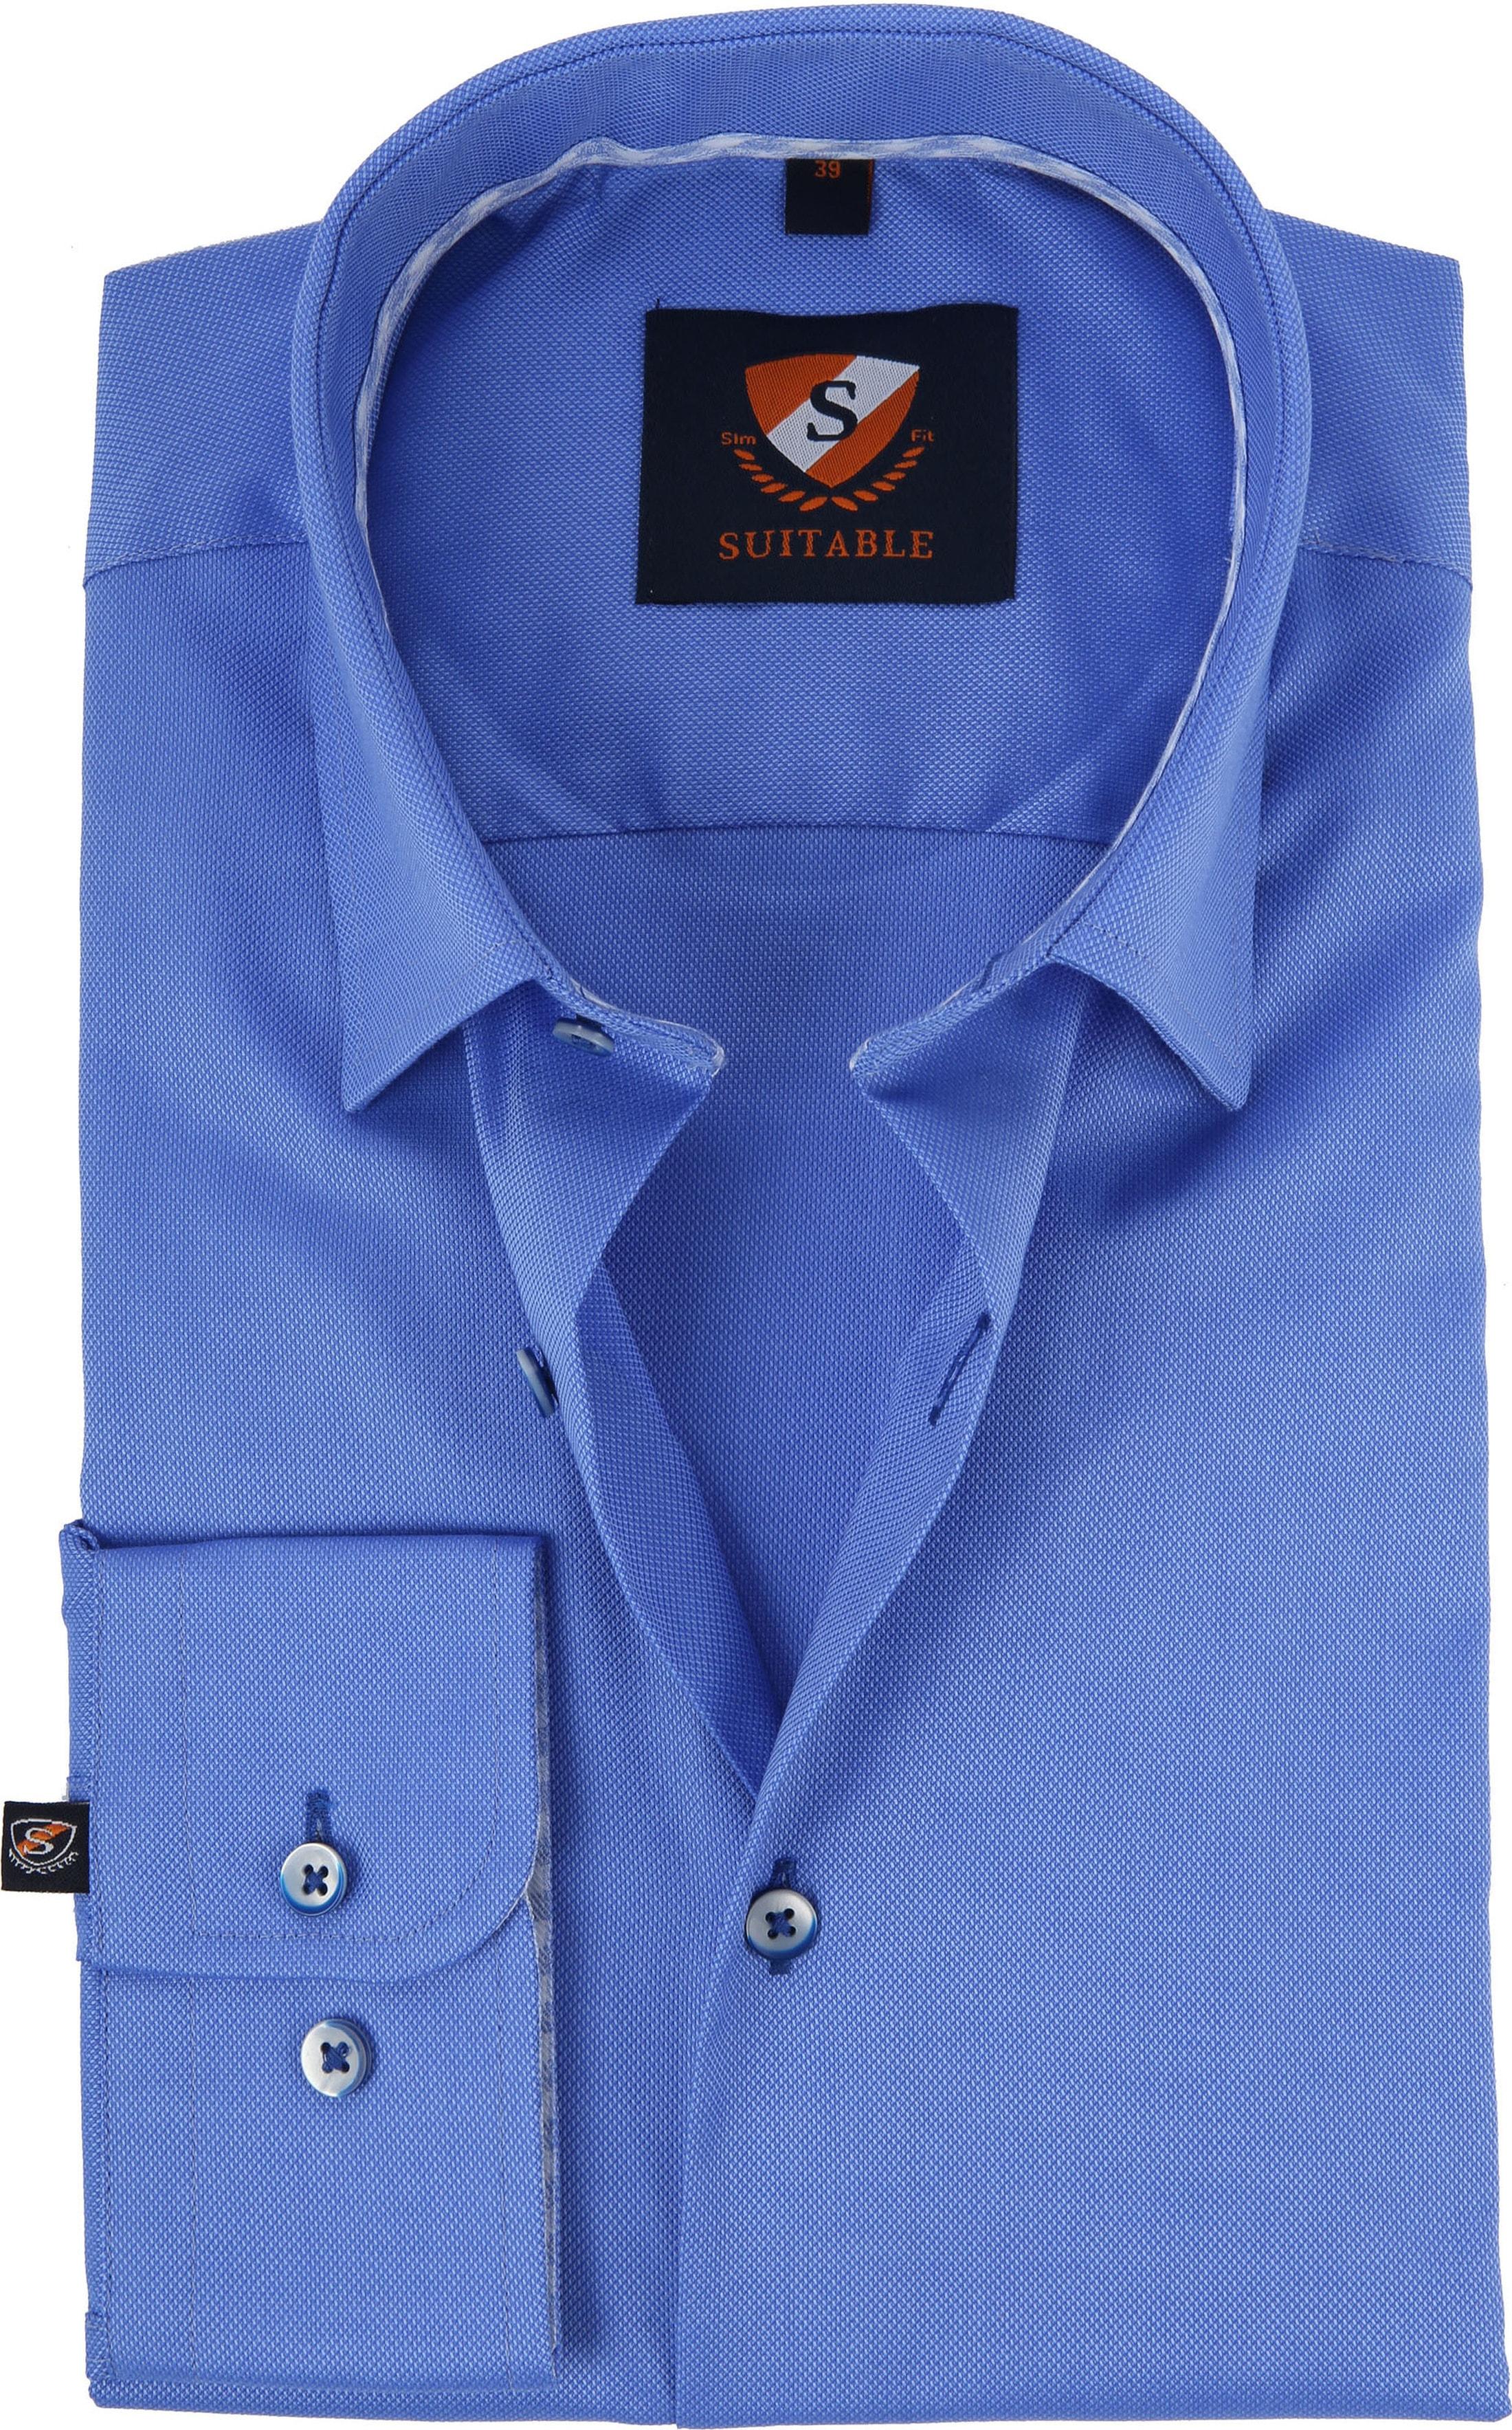 Suitable Overhemd Kobalt HBD foto 0